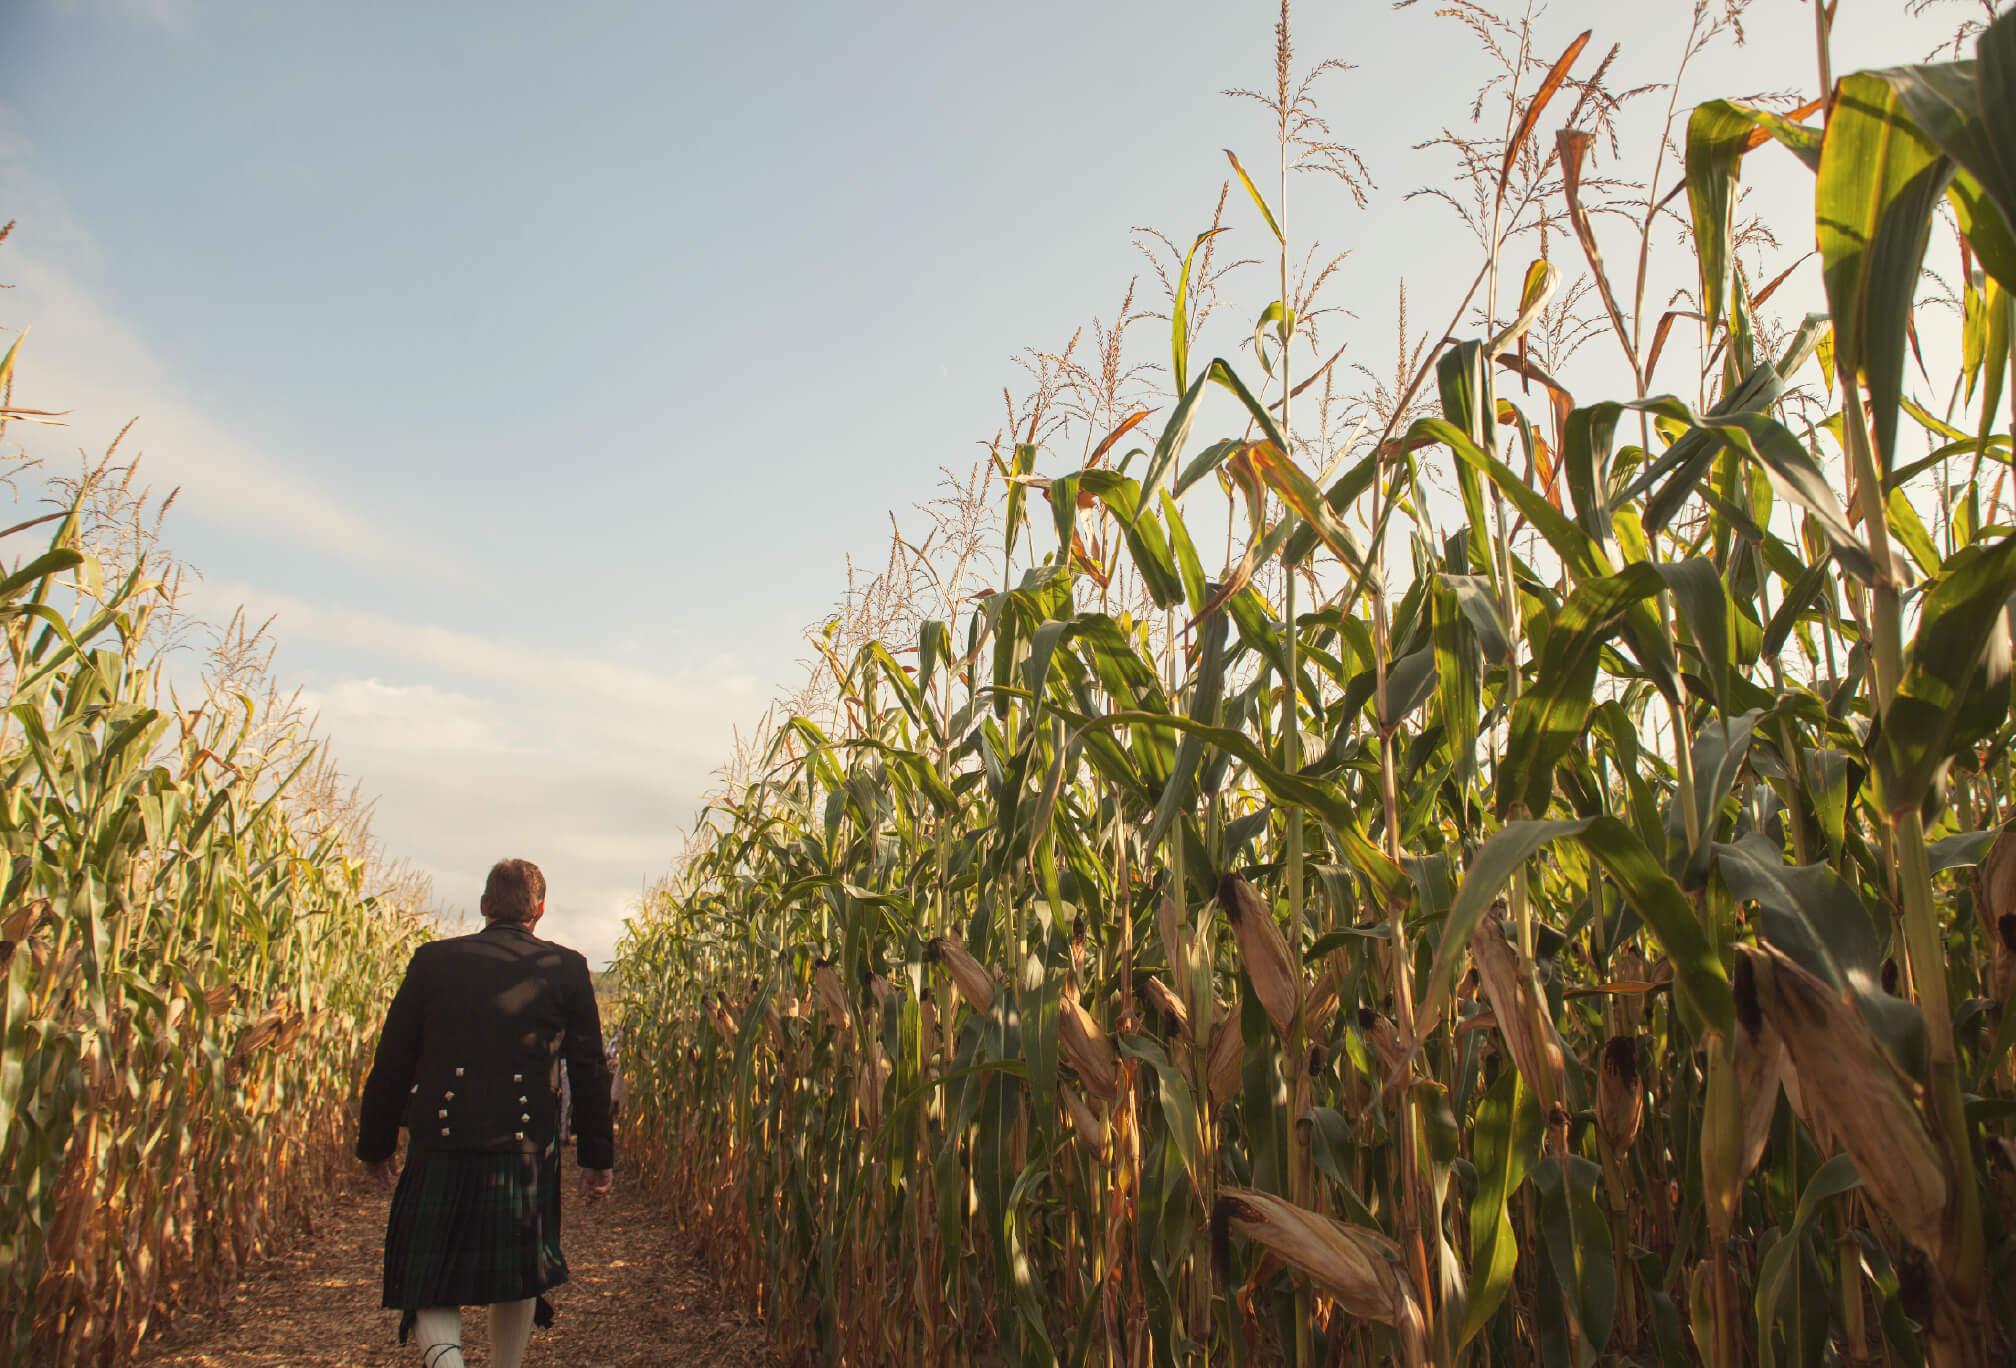 groom walking through cornfield ceremony